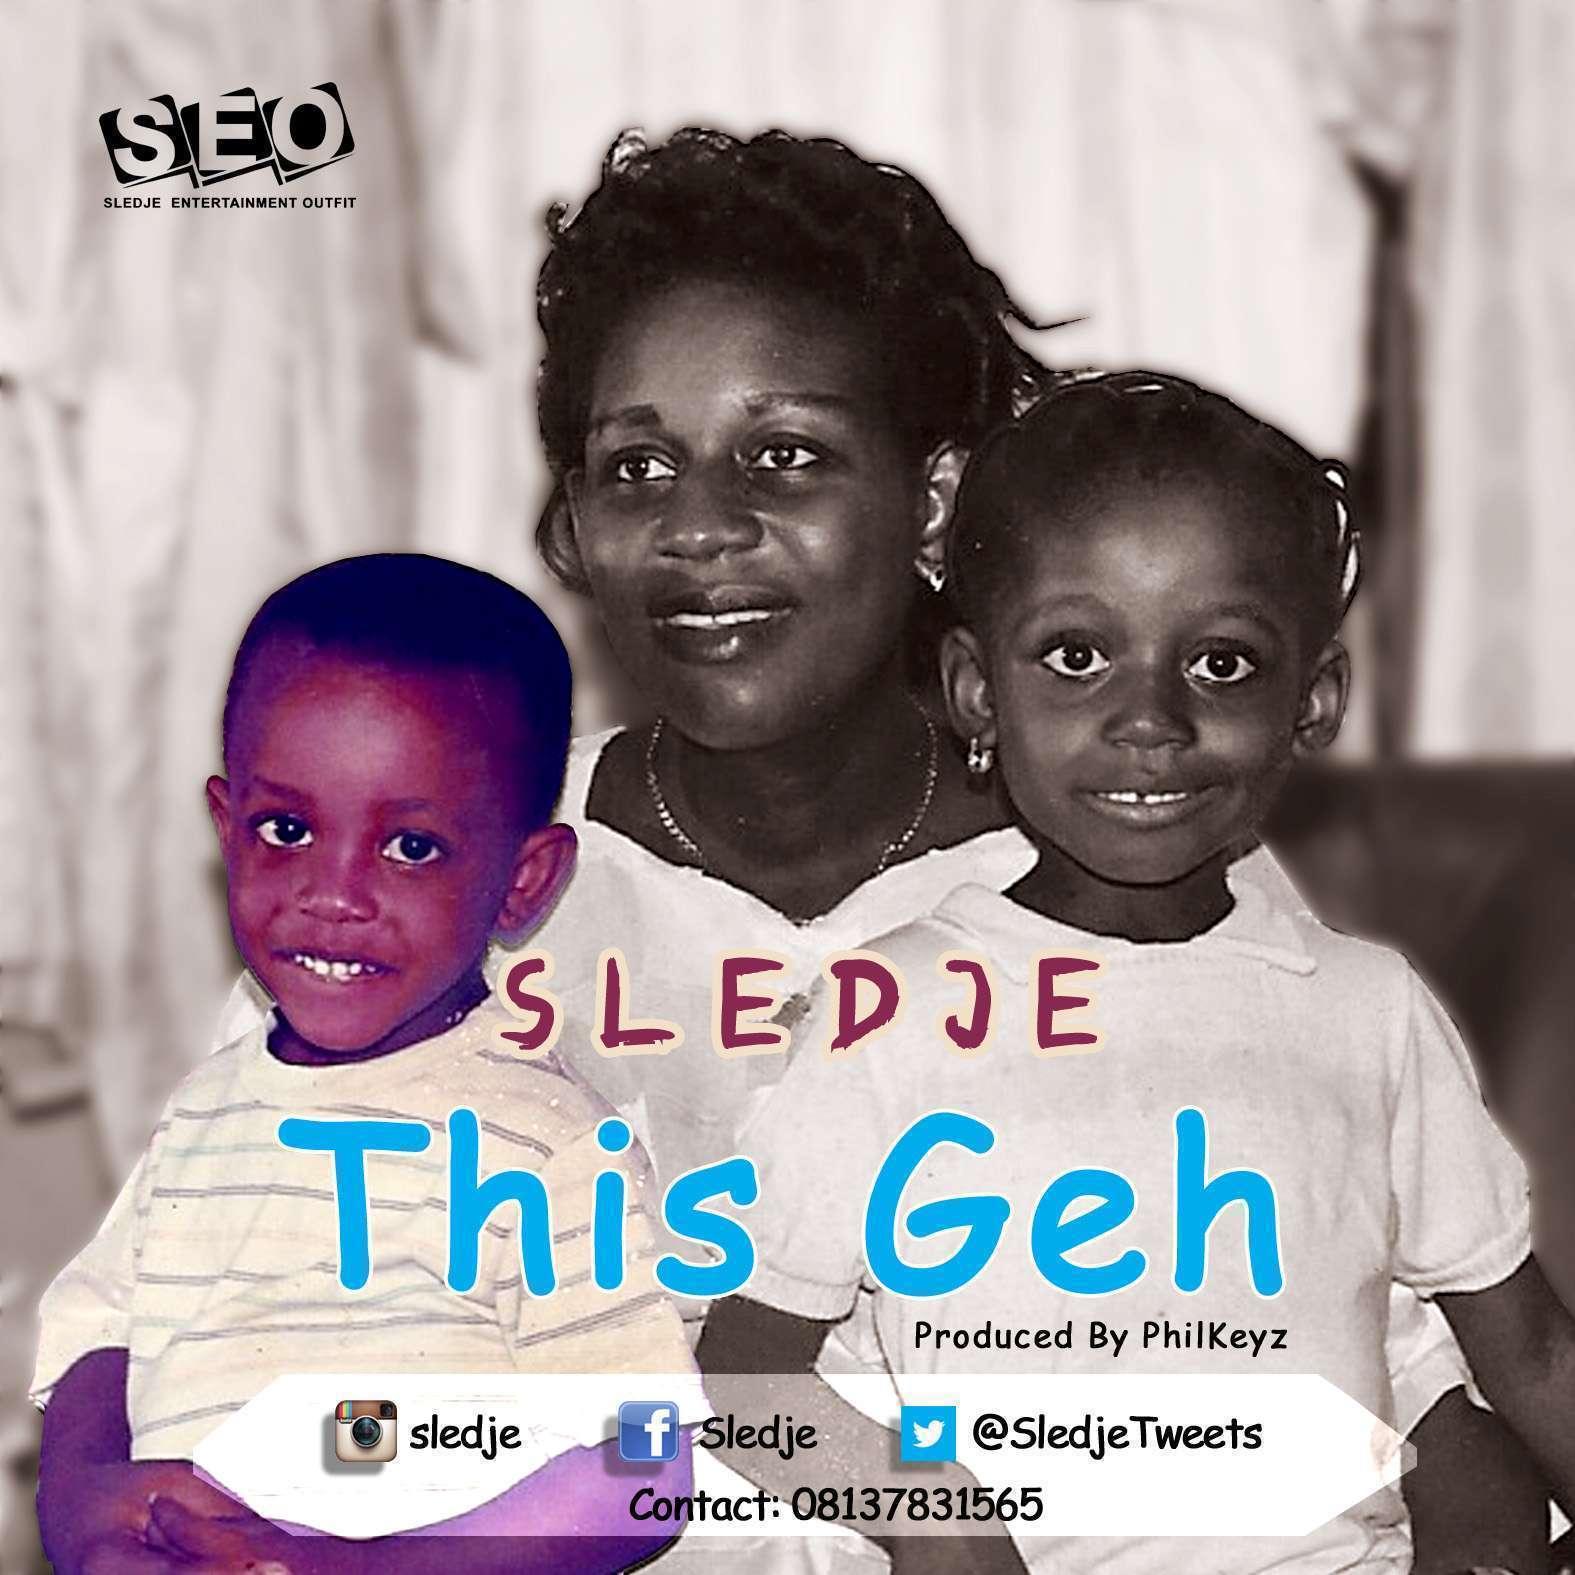 Sledge - This Geh